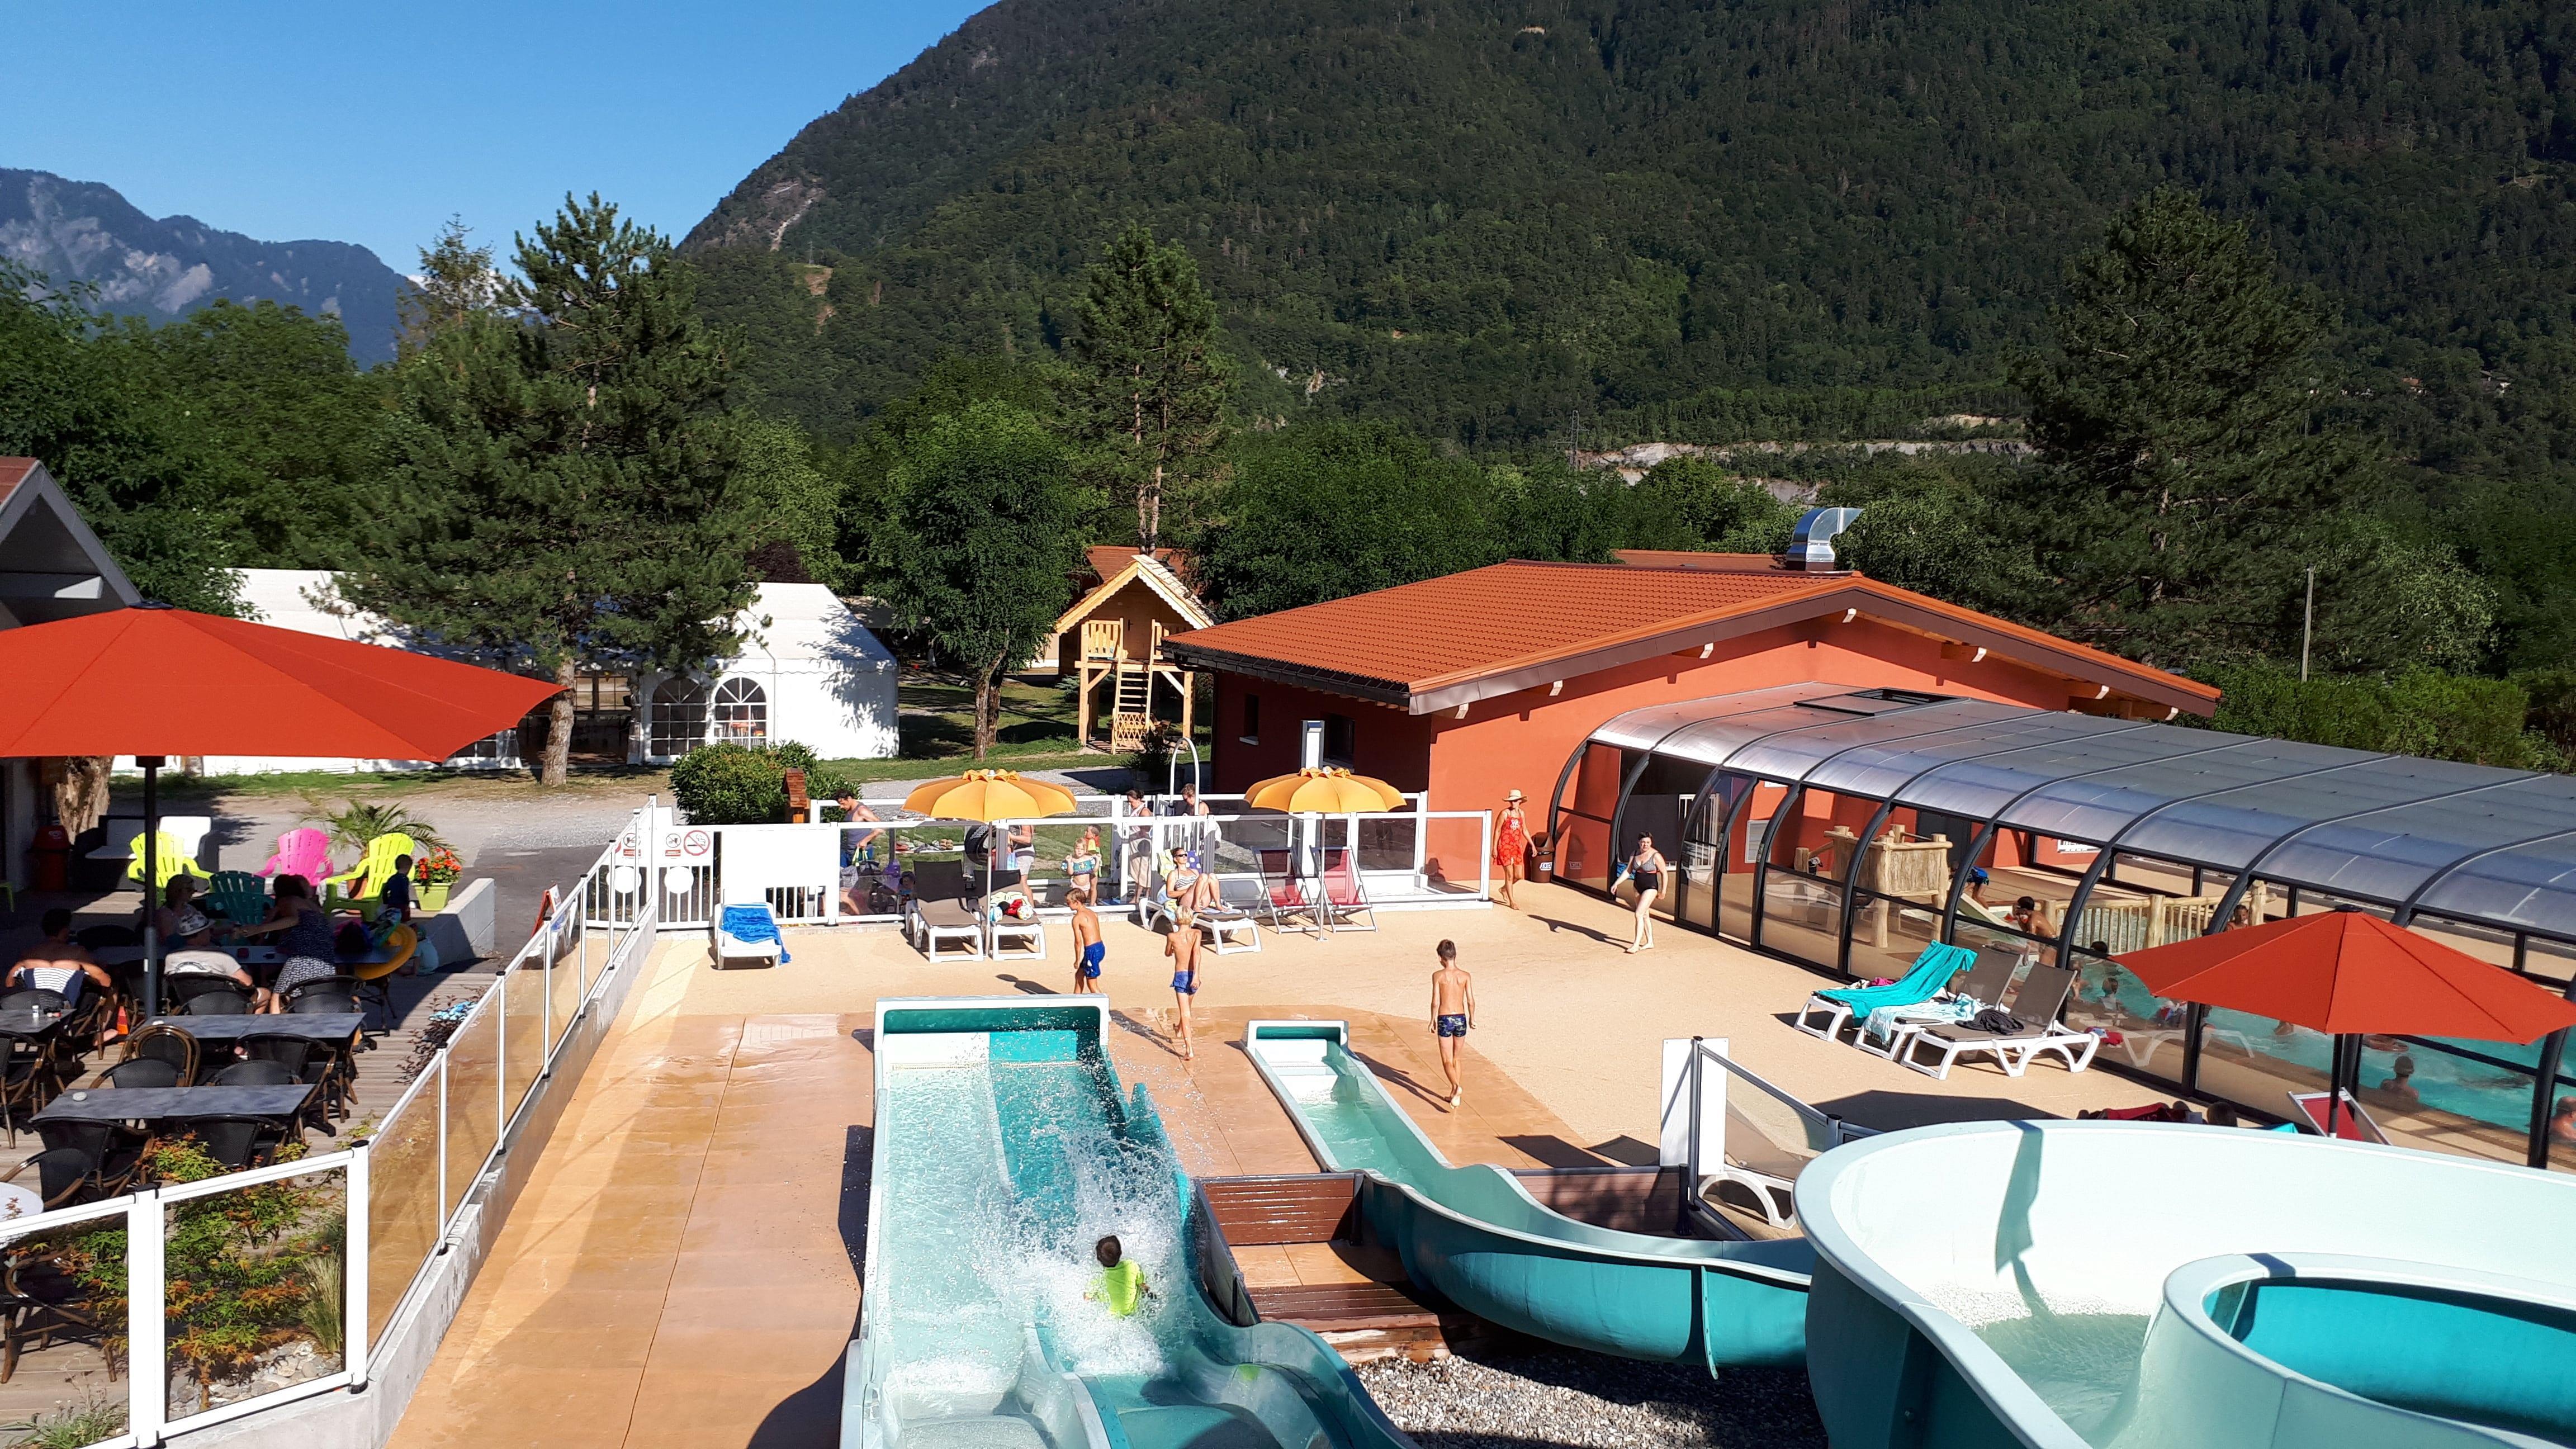 Camping Champ Tillet, Marlens, Haute-Savoie